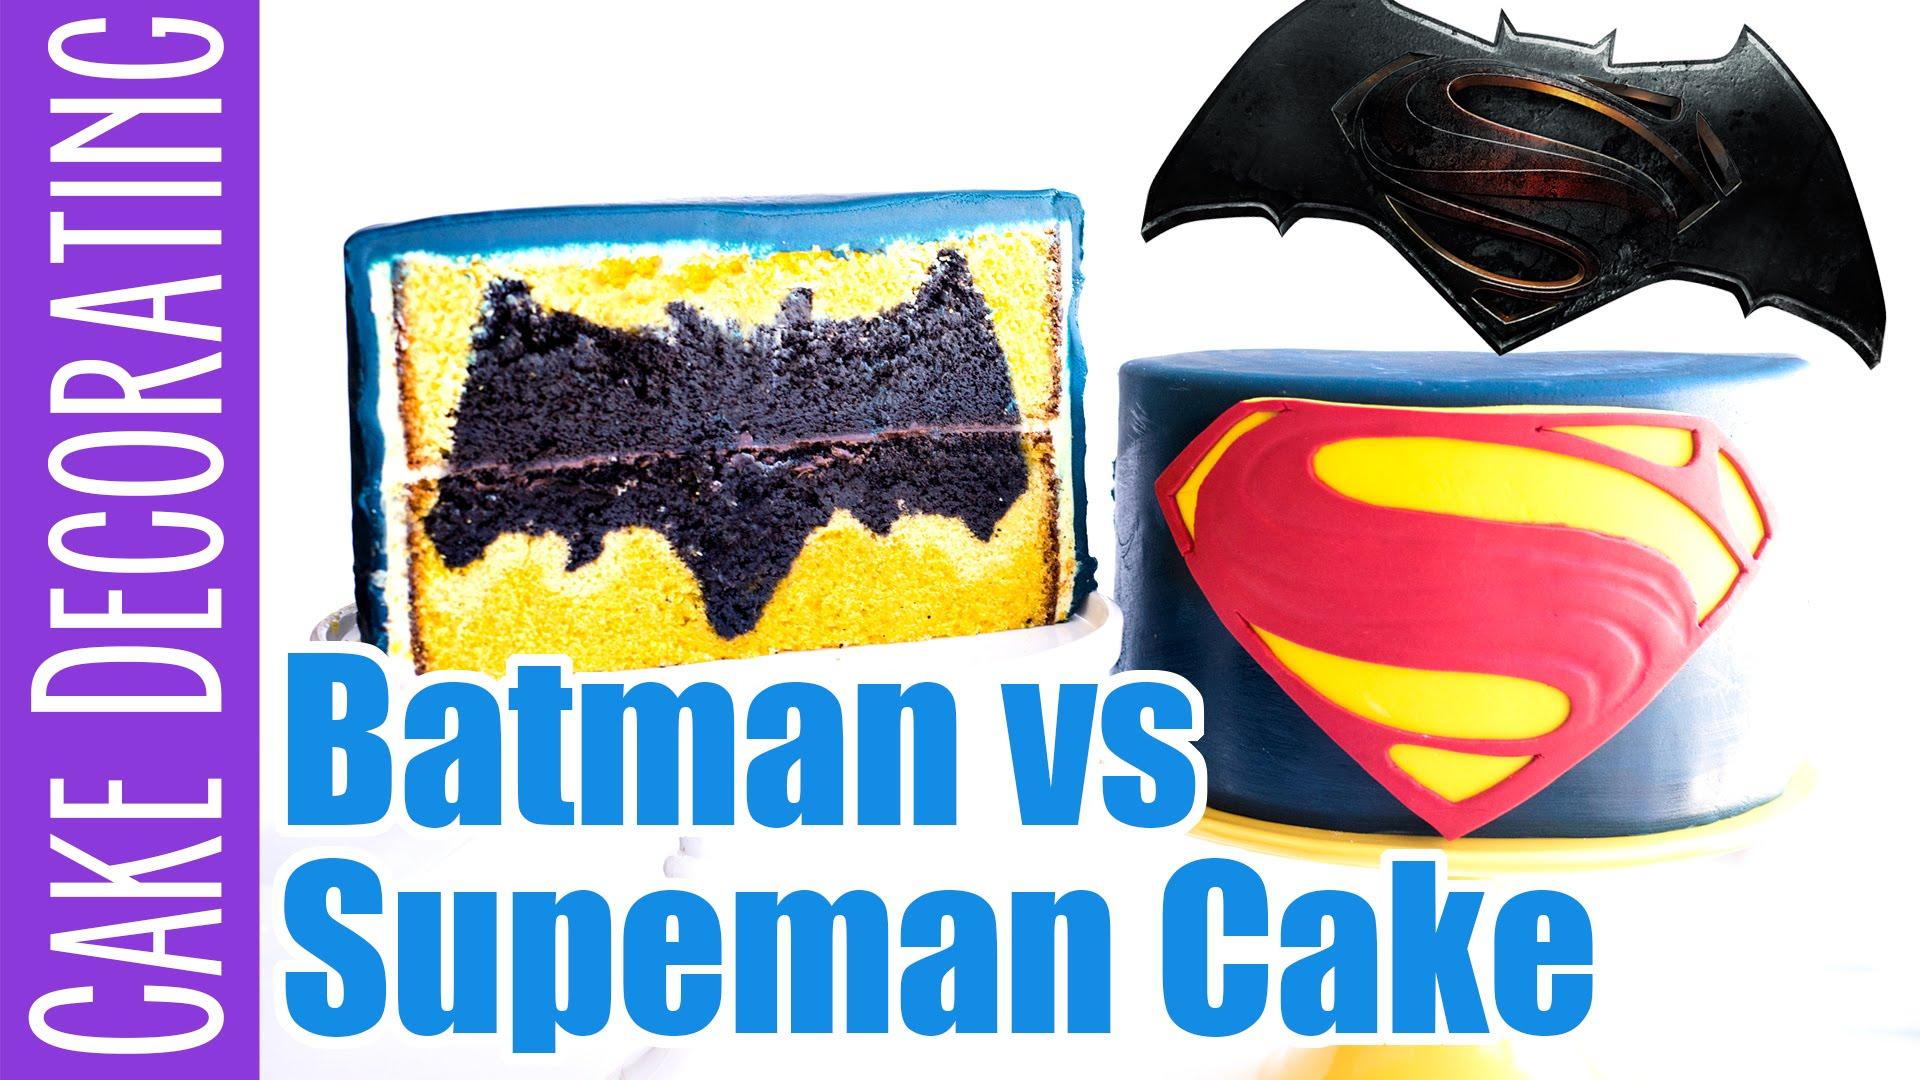 Batman Vs Superman Design Inside Cake Video Tutorial Ashlee